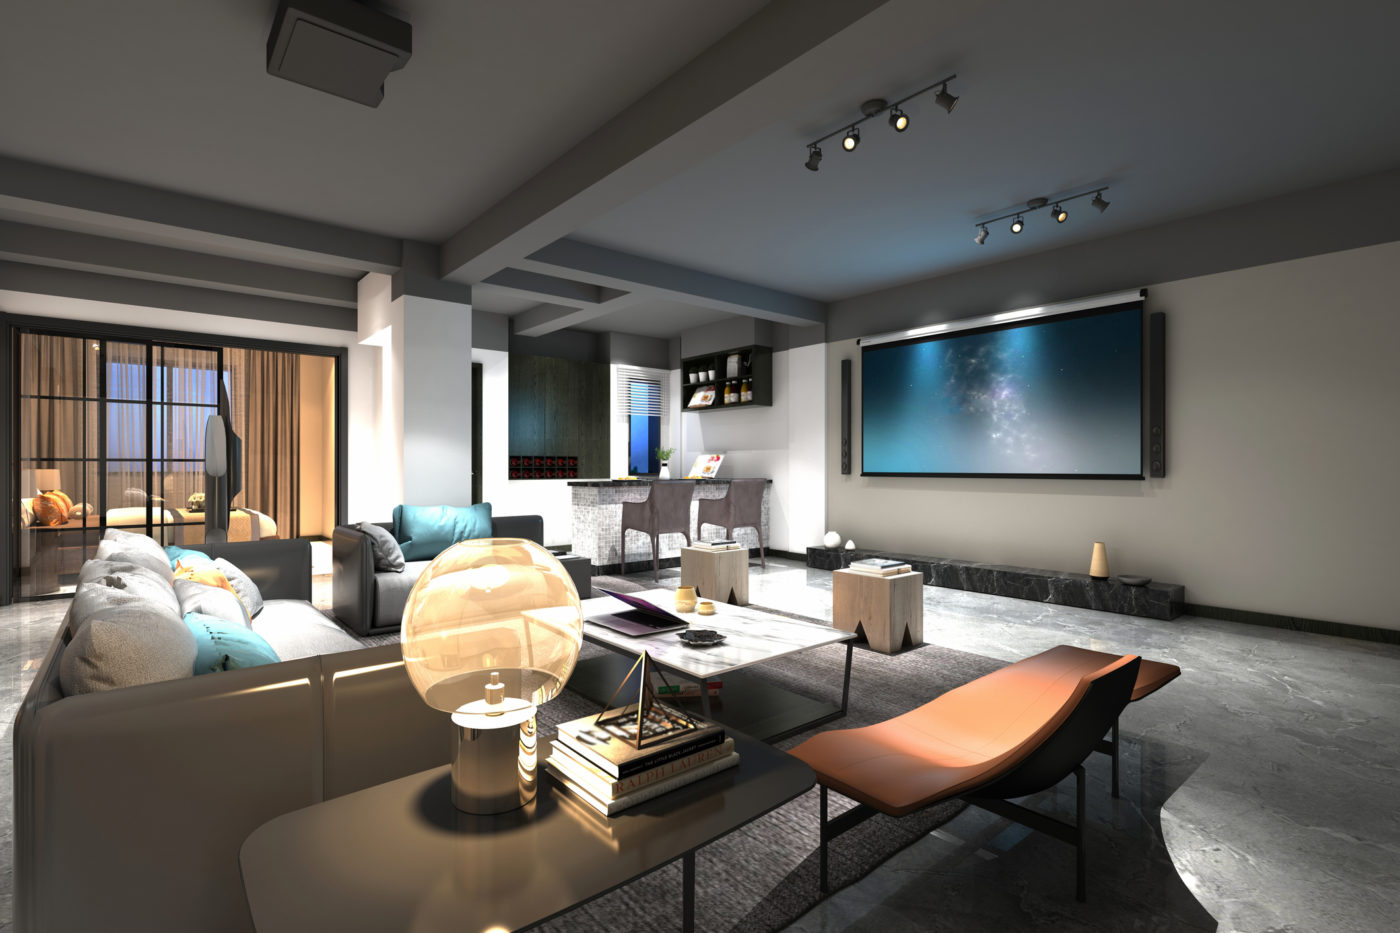 Home Theater Design In West Palm Beach FL